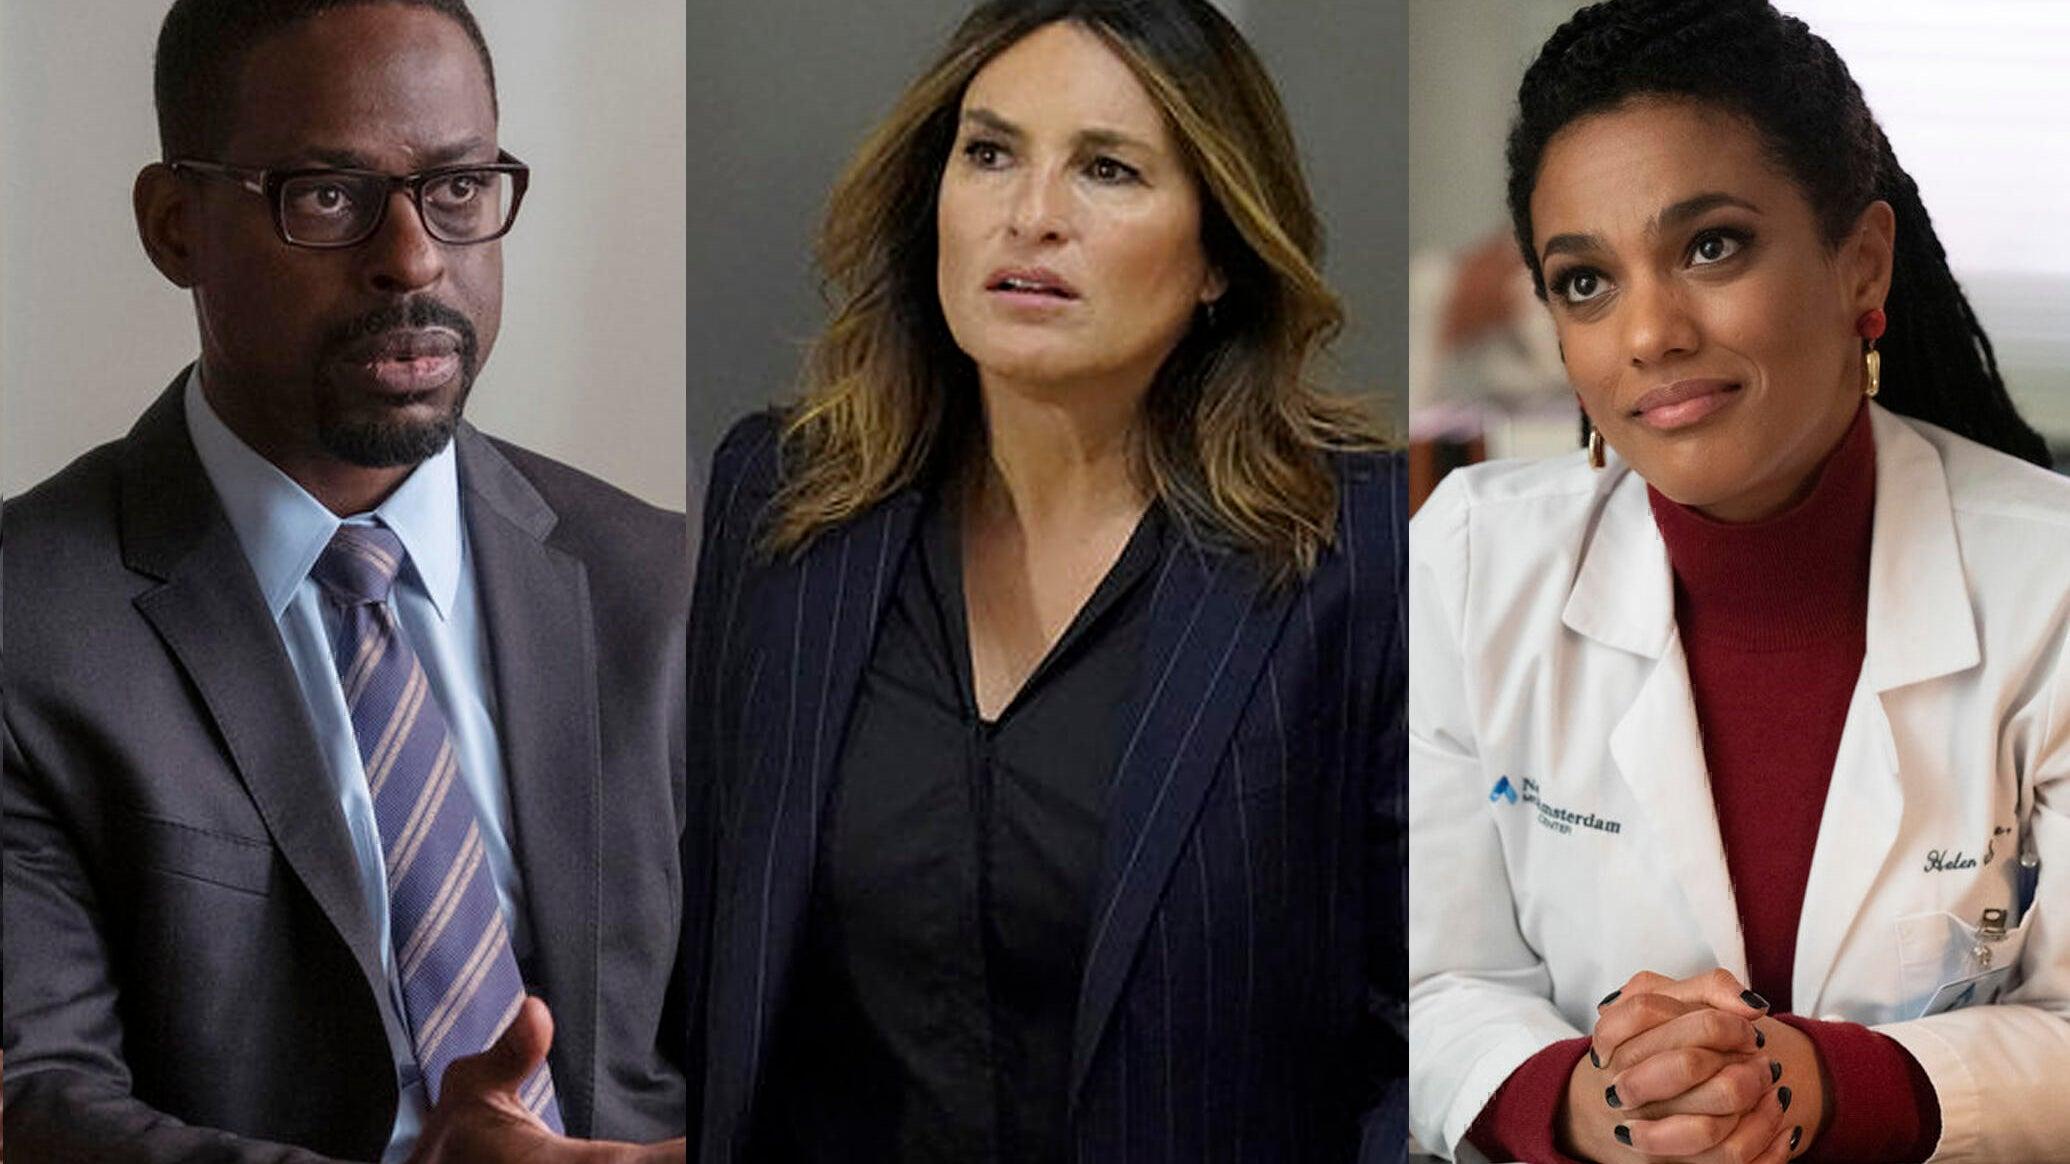 Sterling K. Brown (This Is Us), Mariska Hargitay (Law & Order: SVU), Freema Agyeman (New Amsterdam)